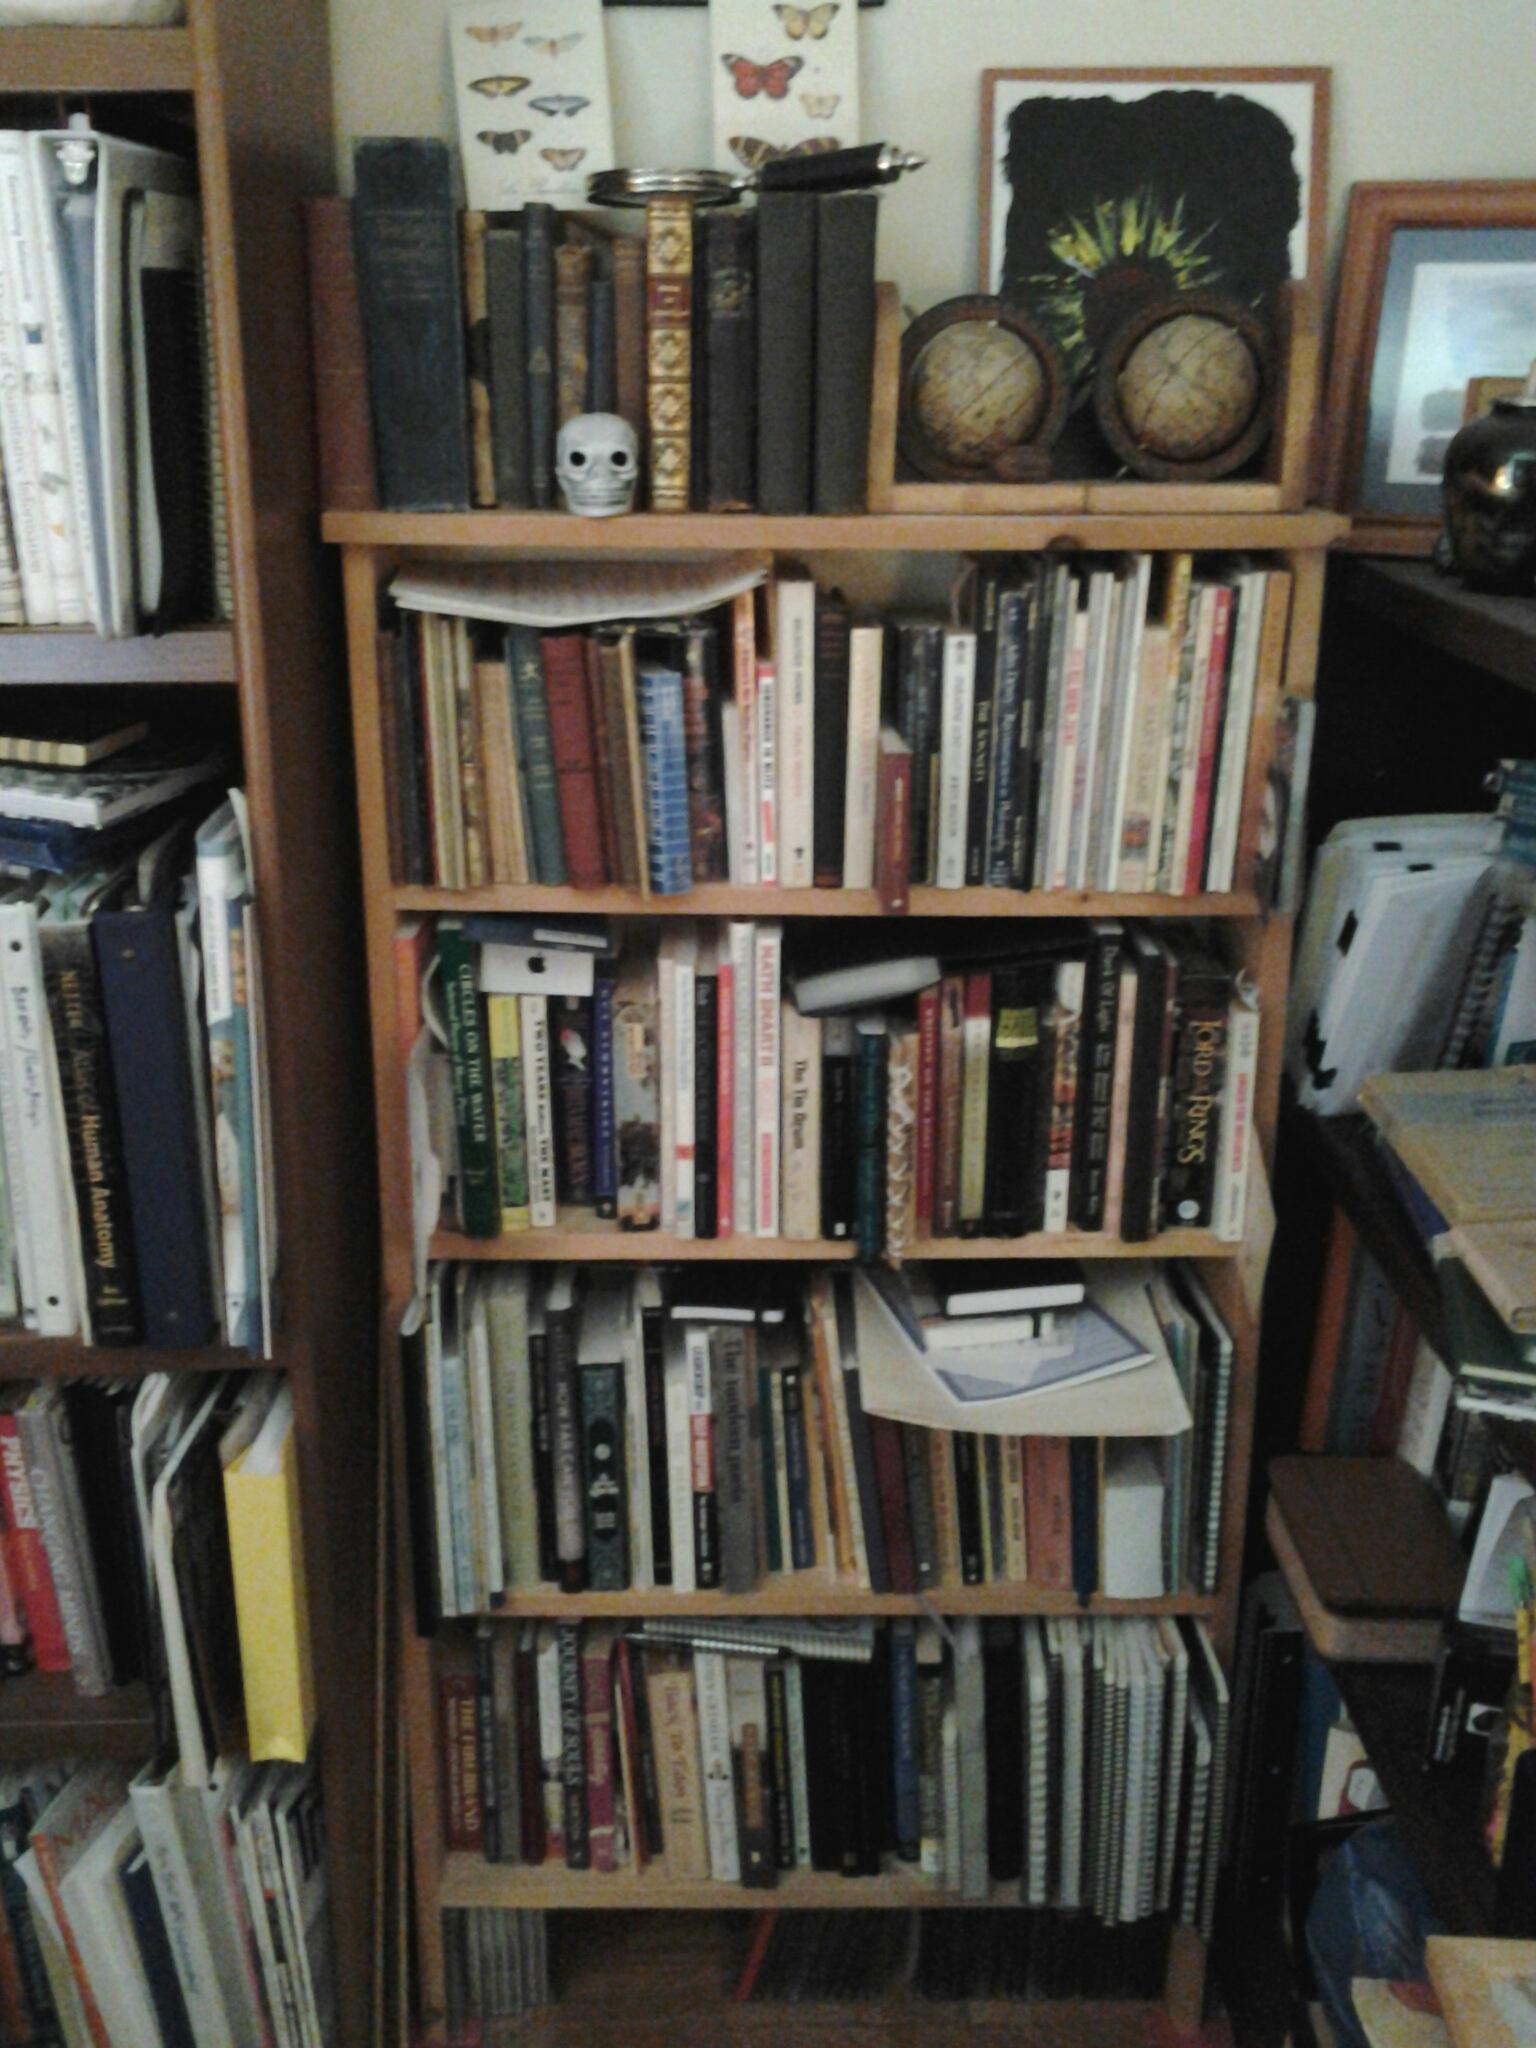 Bookshelf 3 - Religion, philosophy, travel